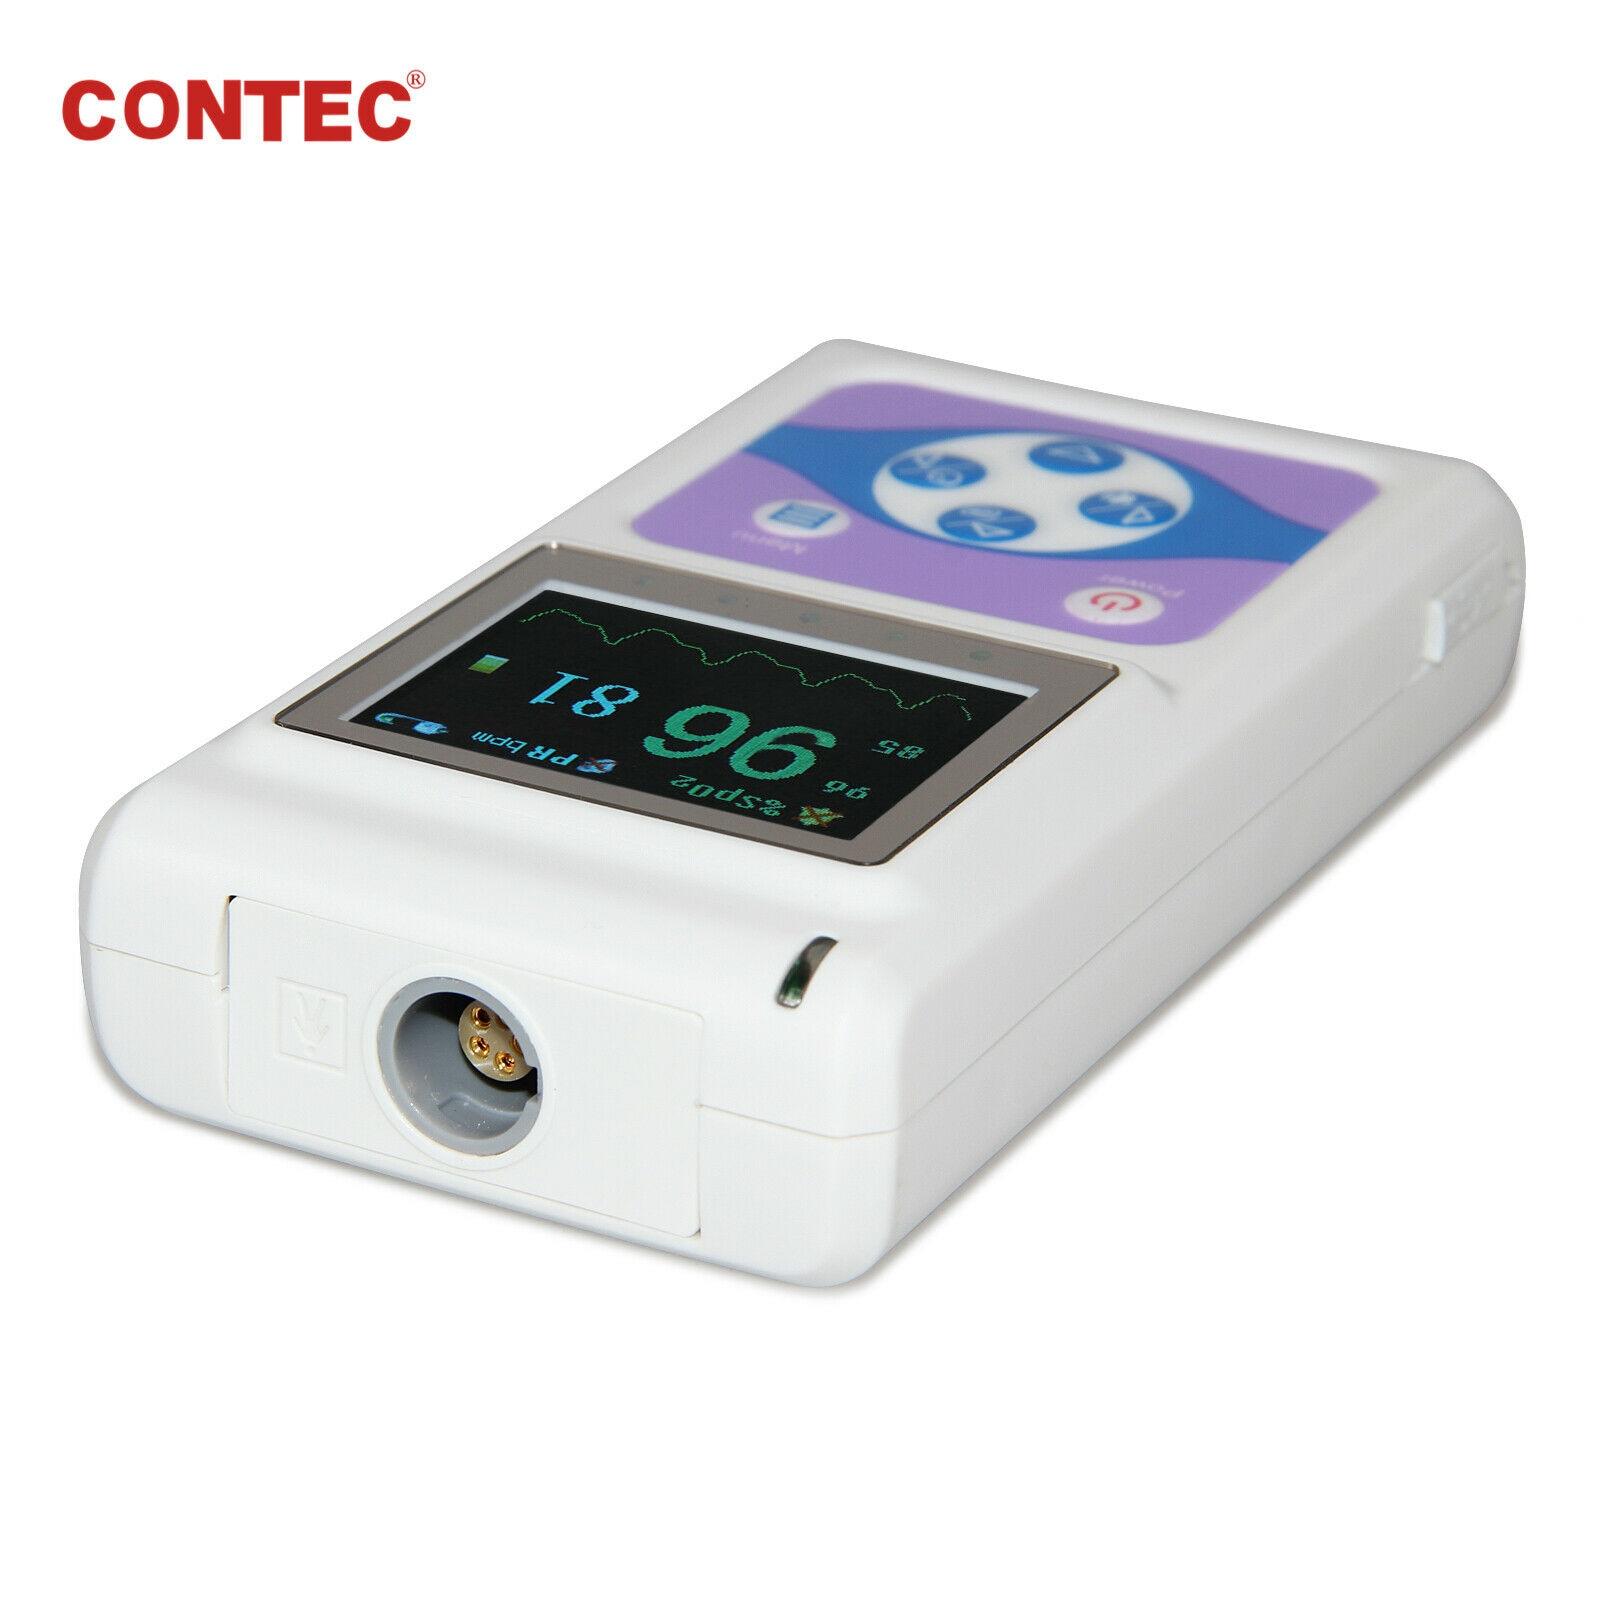 24h Finger pulsoximeter SpO2 Herz Rate Monitor + 3 sonden Erwachsene/kinder, alarm oximetro de dedo oximeter daten - 2